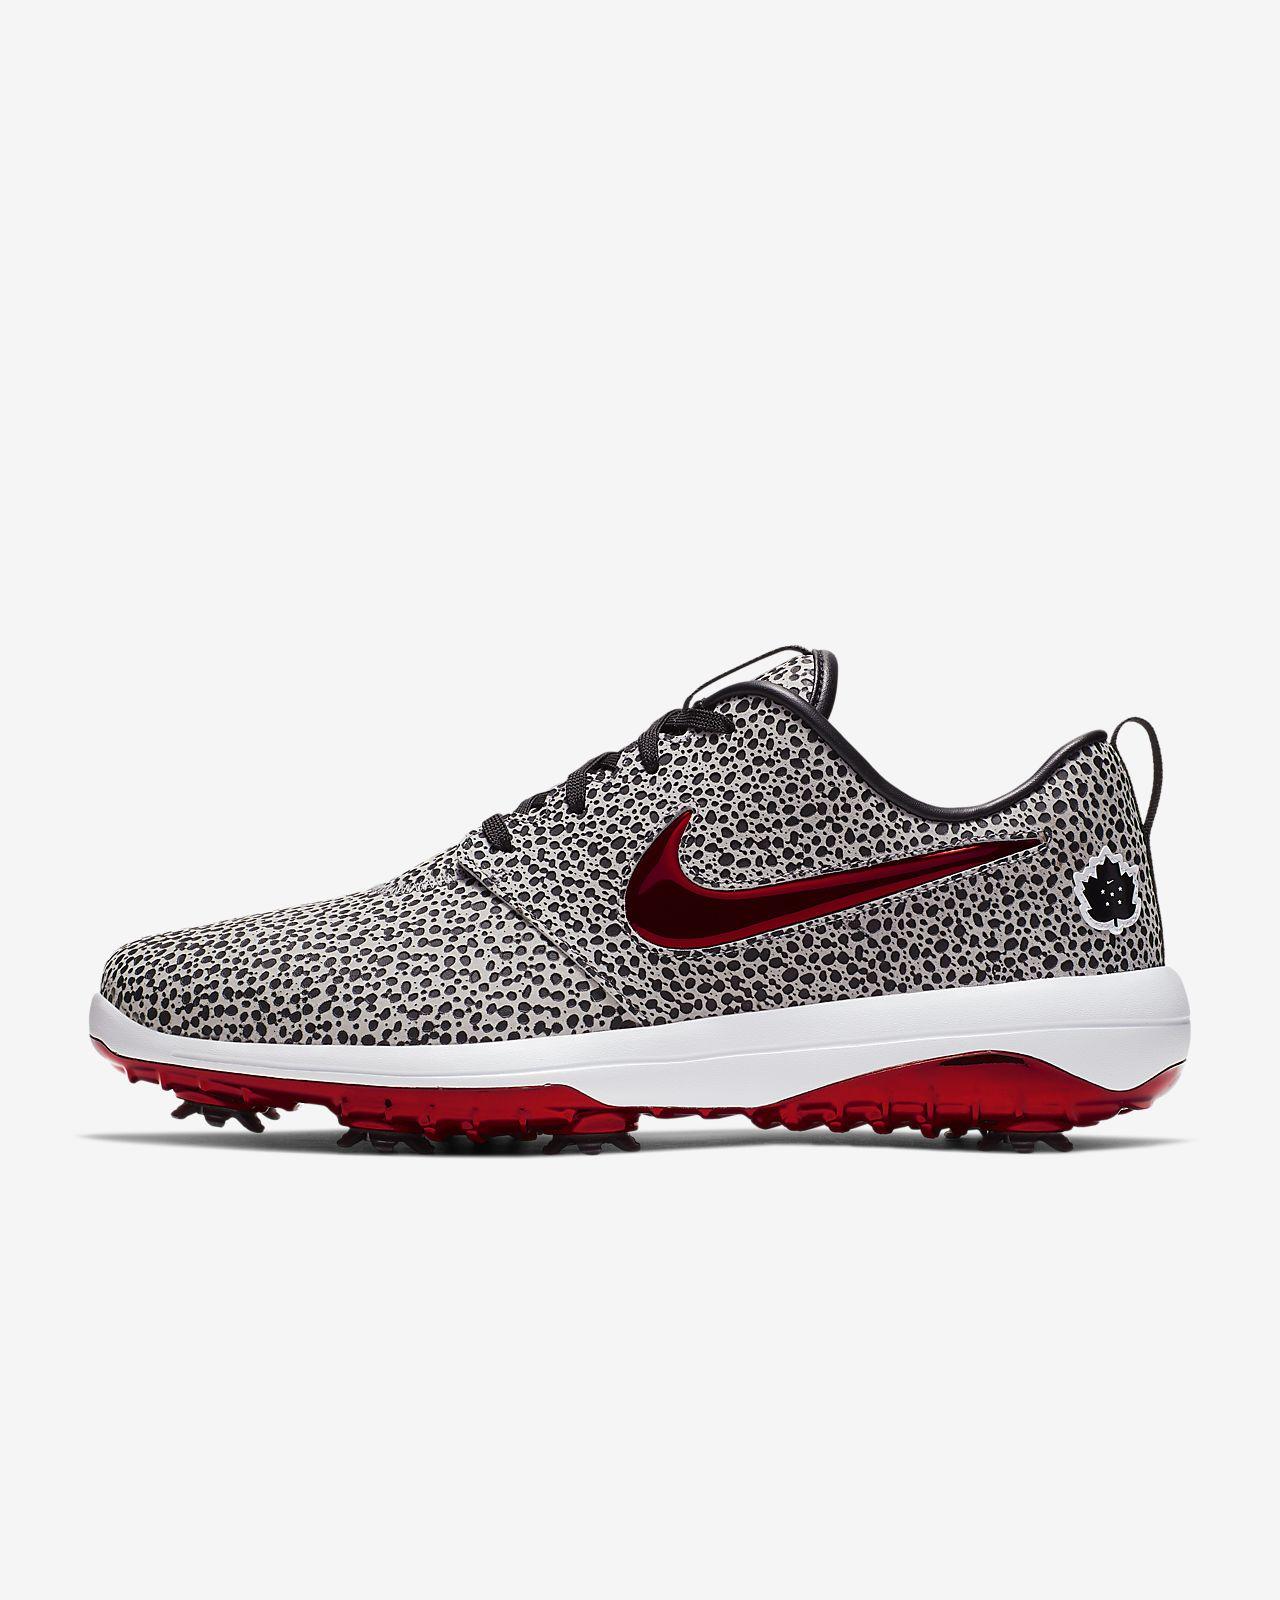 pretty nice 49c85 af015 ... Chaussure de golf Nike Roshe G Tour NRG pour Homme